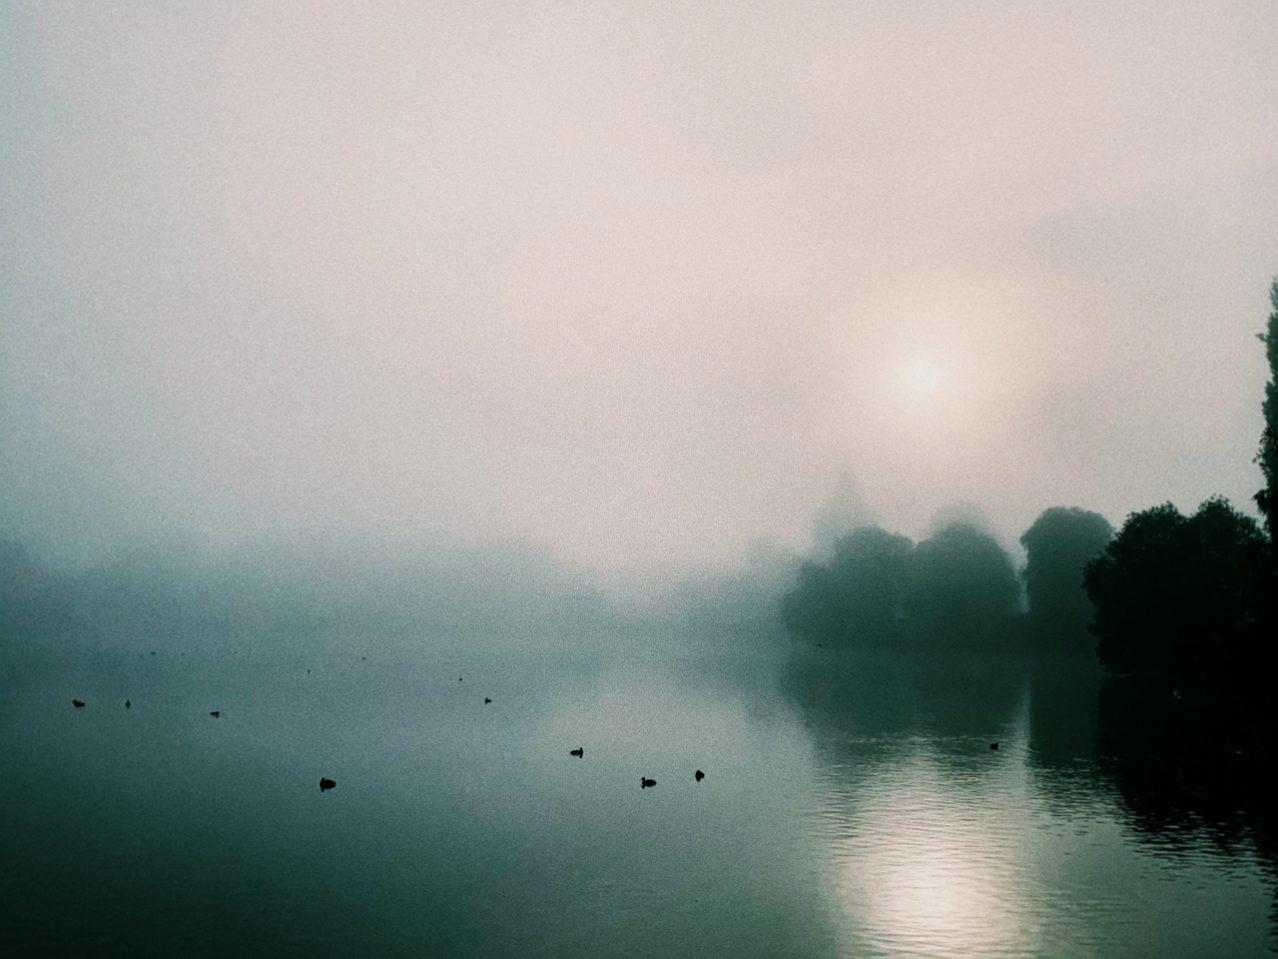 Söndagen då dimman kom